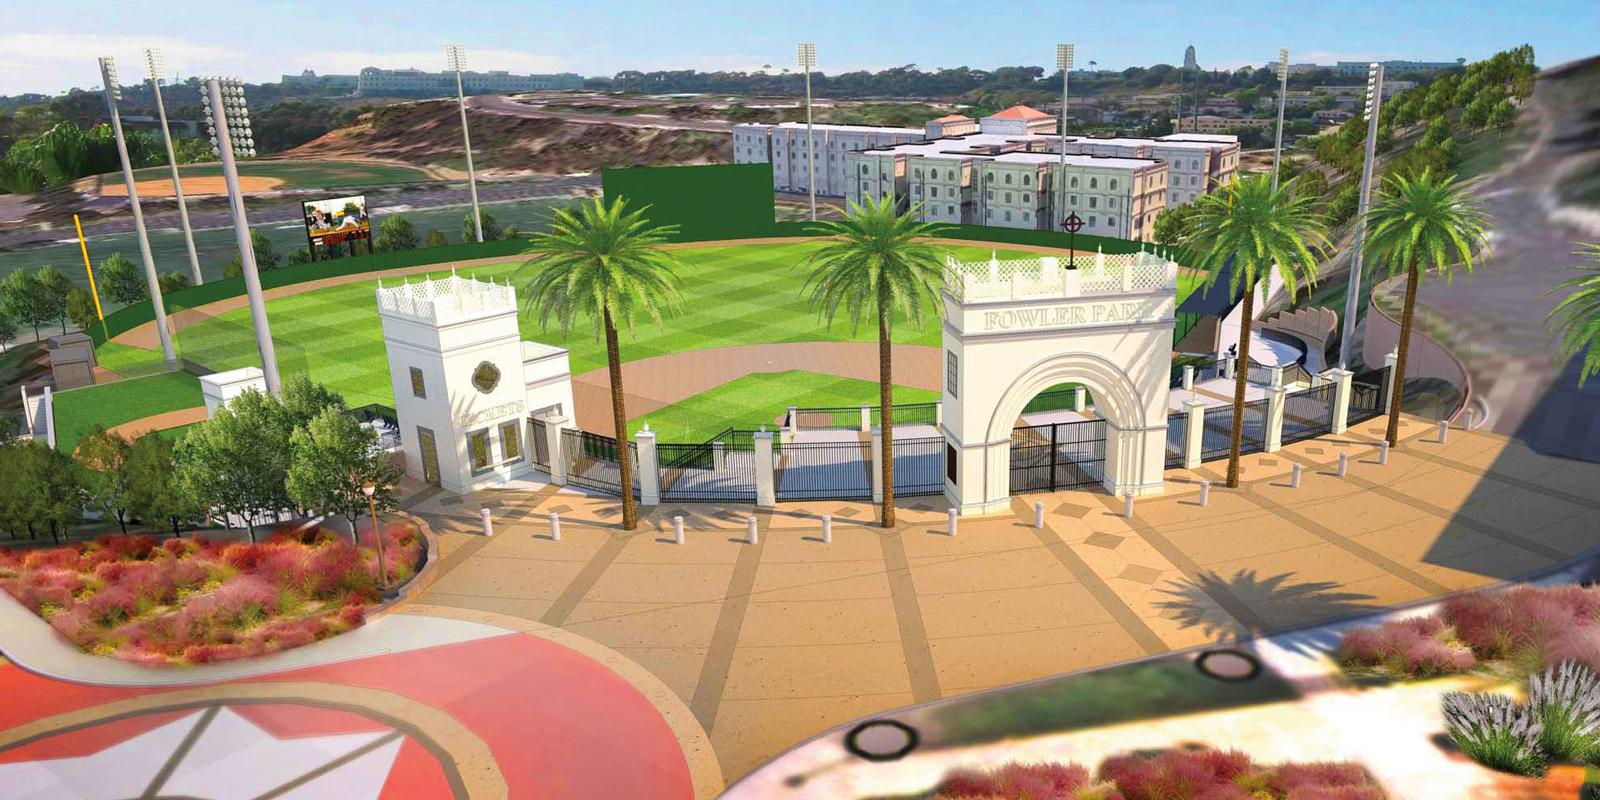 Artist rendering of USD's Fowler Park